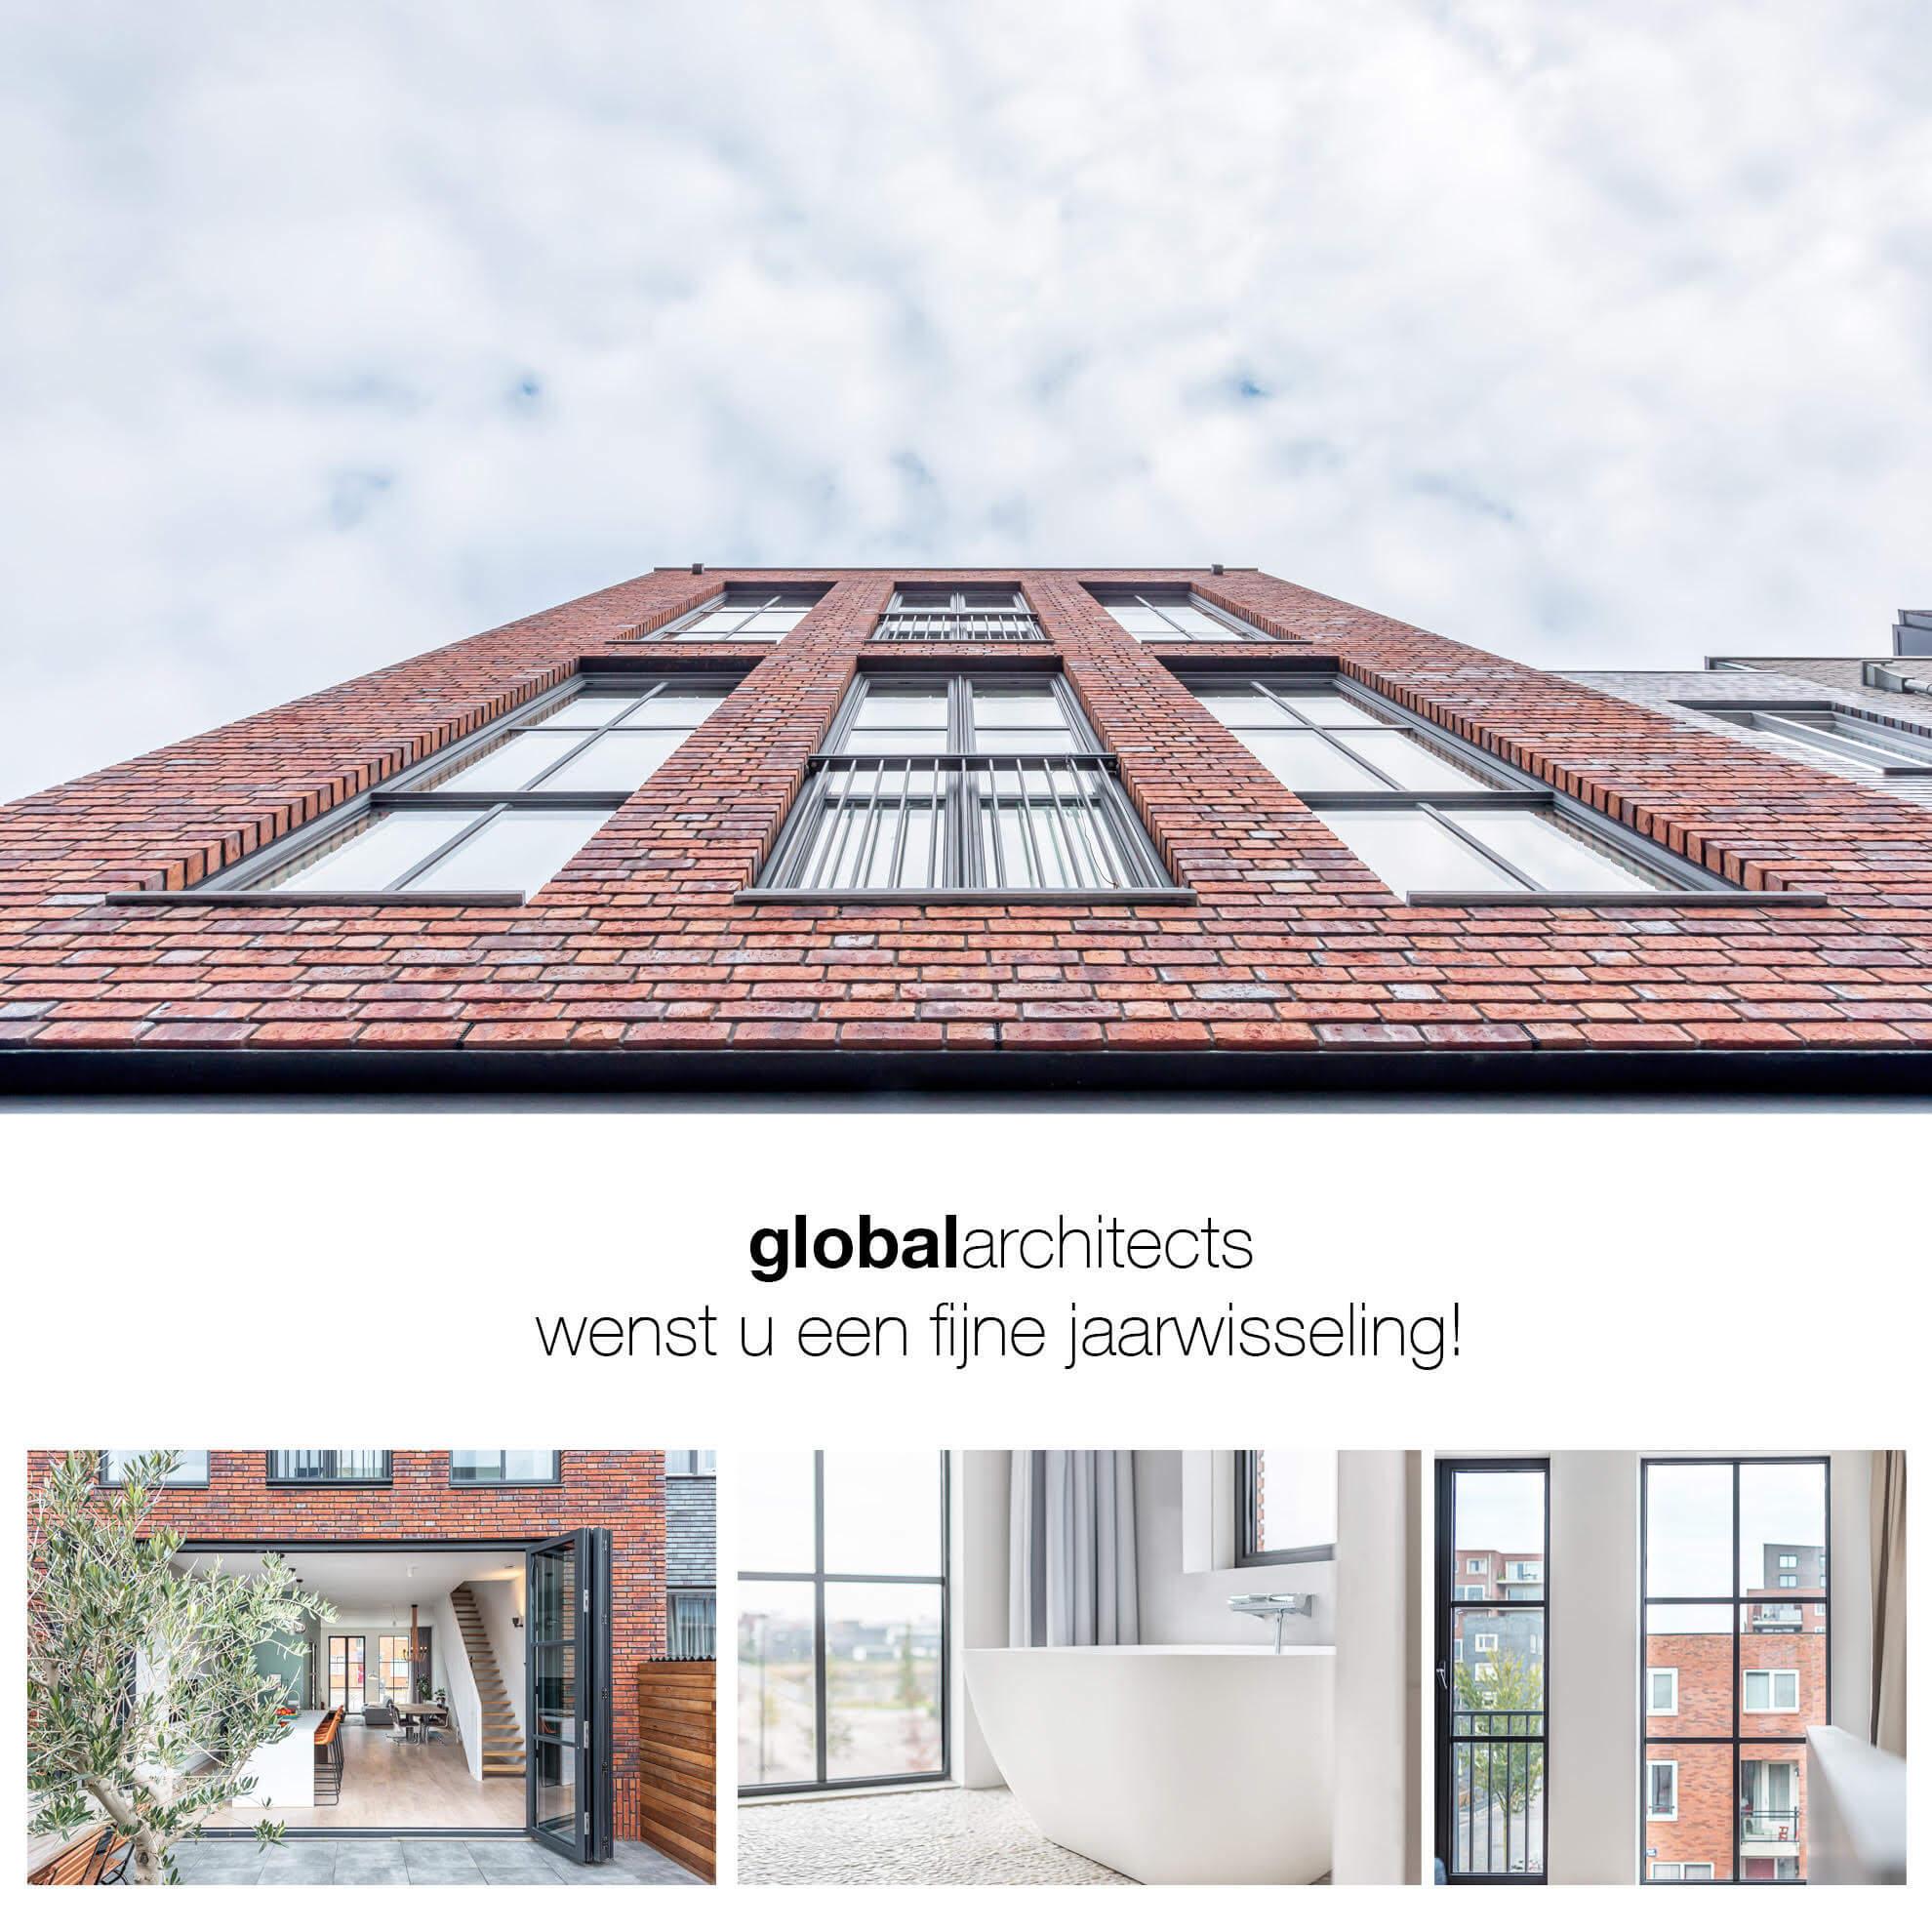 hoogtepunten-globalarchitects-2018